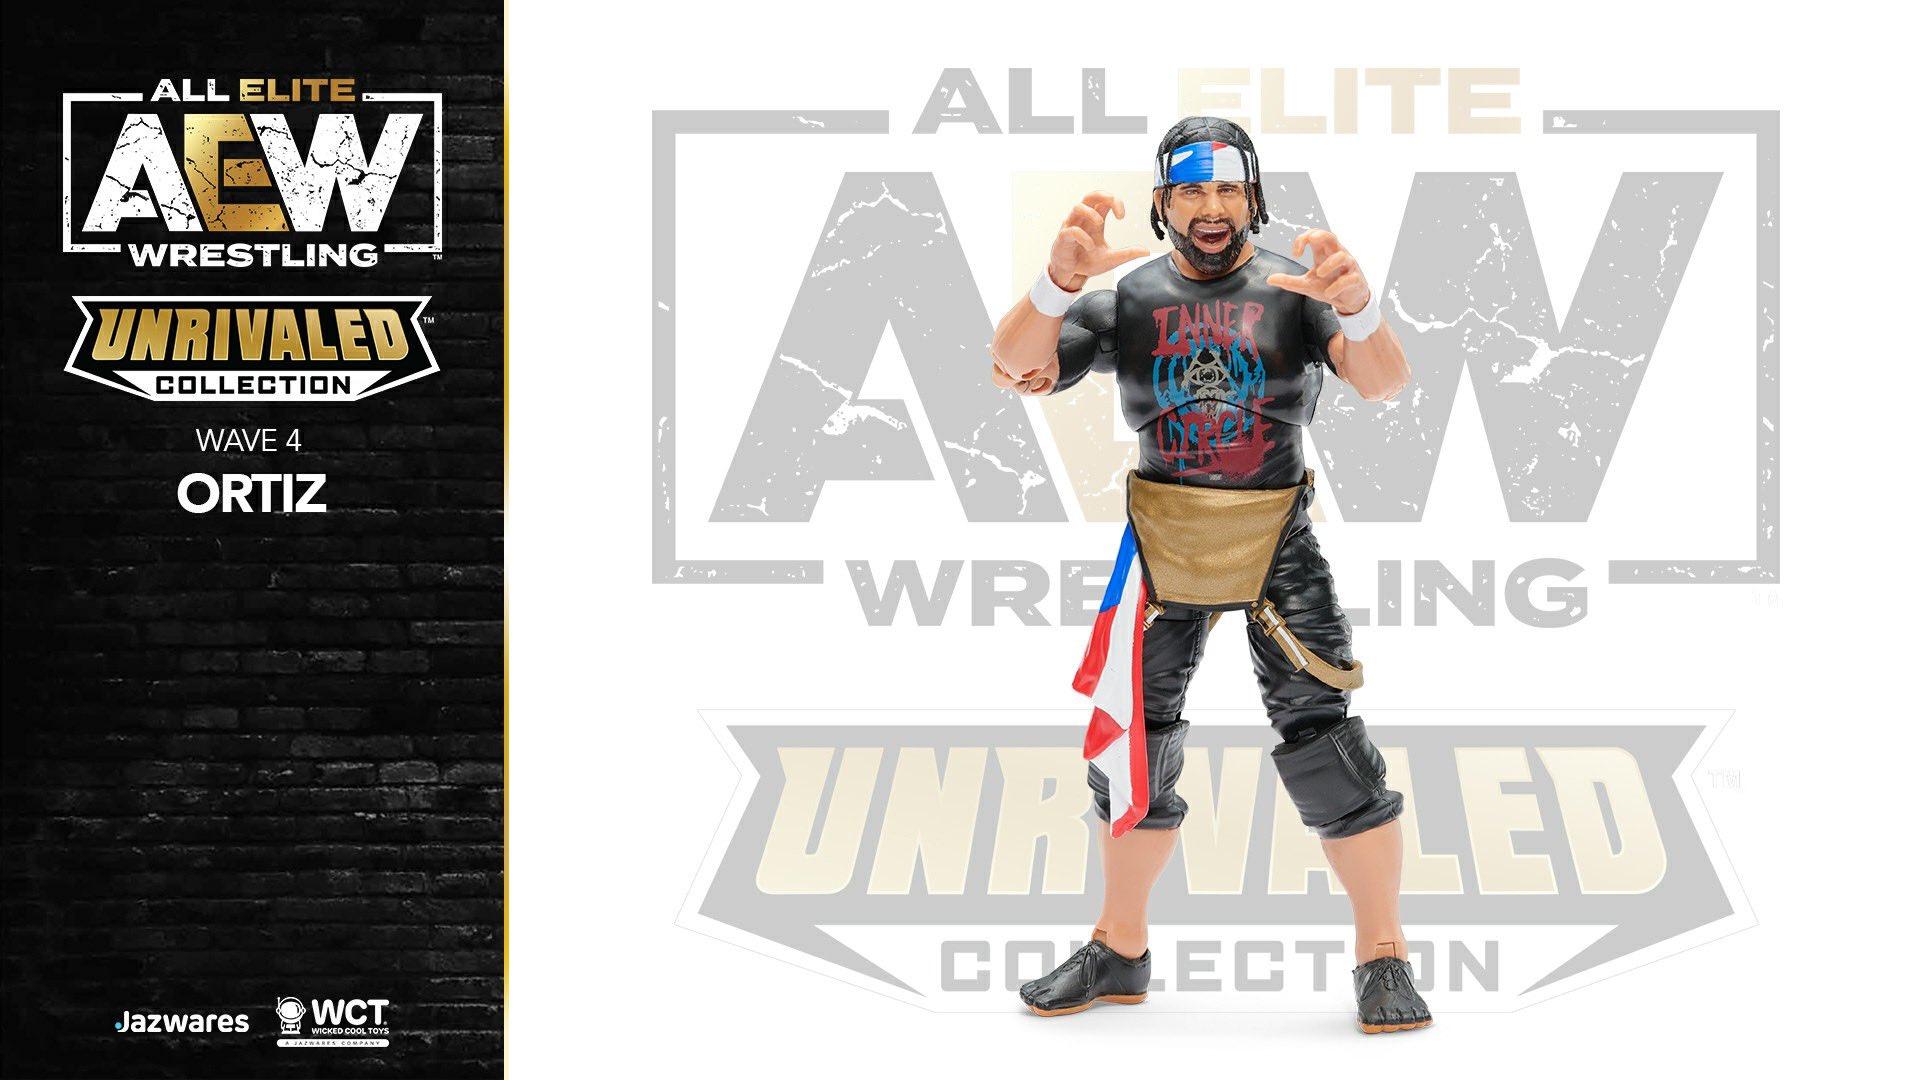 AEW Unrivaled Series Four Revealed, Matt Hardy, Sammy, Cody, More